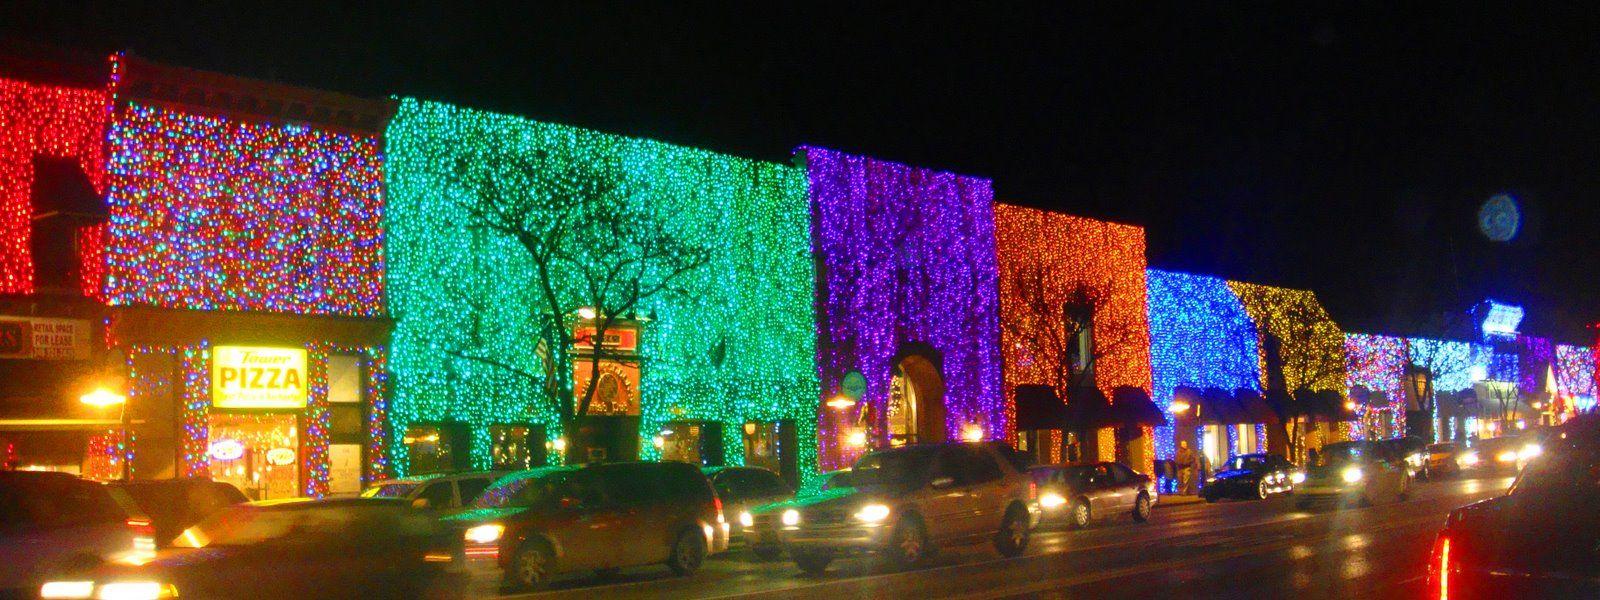 My Hometown Rochester Michigan I Lovvvve Christmas Time Christmas Lights Holiday Lights Outdoor Christmas